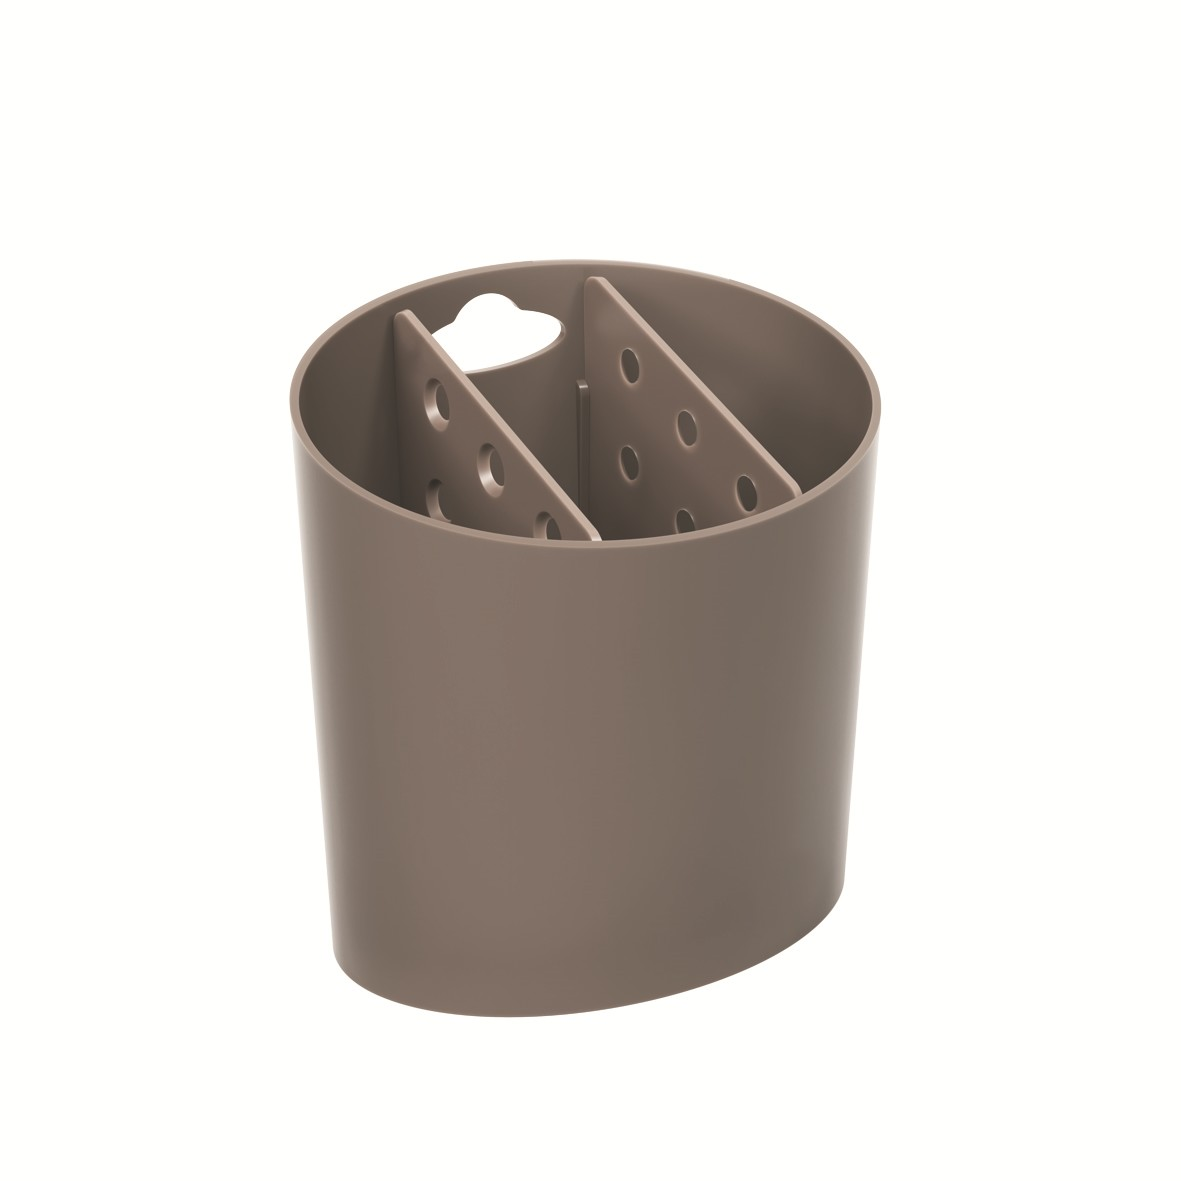 Escorredor de Talheres de Plastico Oval Warm Gray - Coza